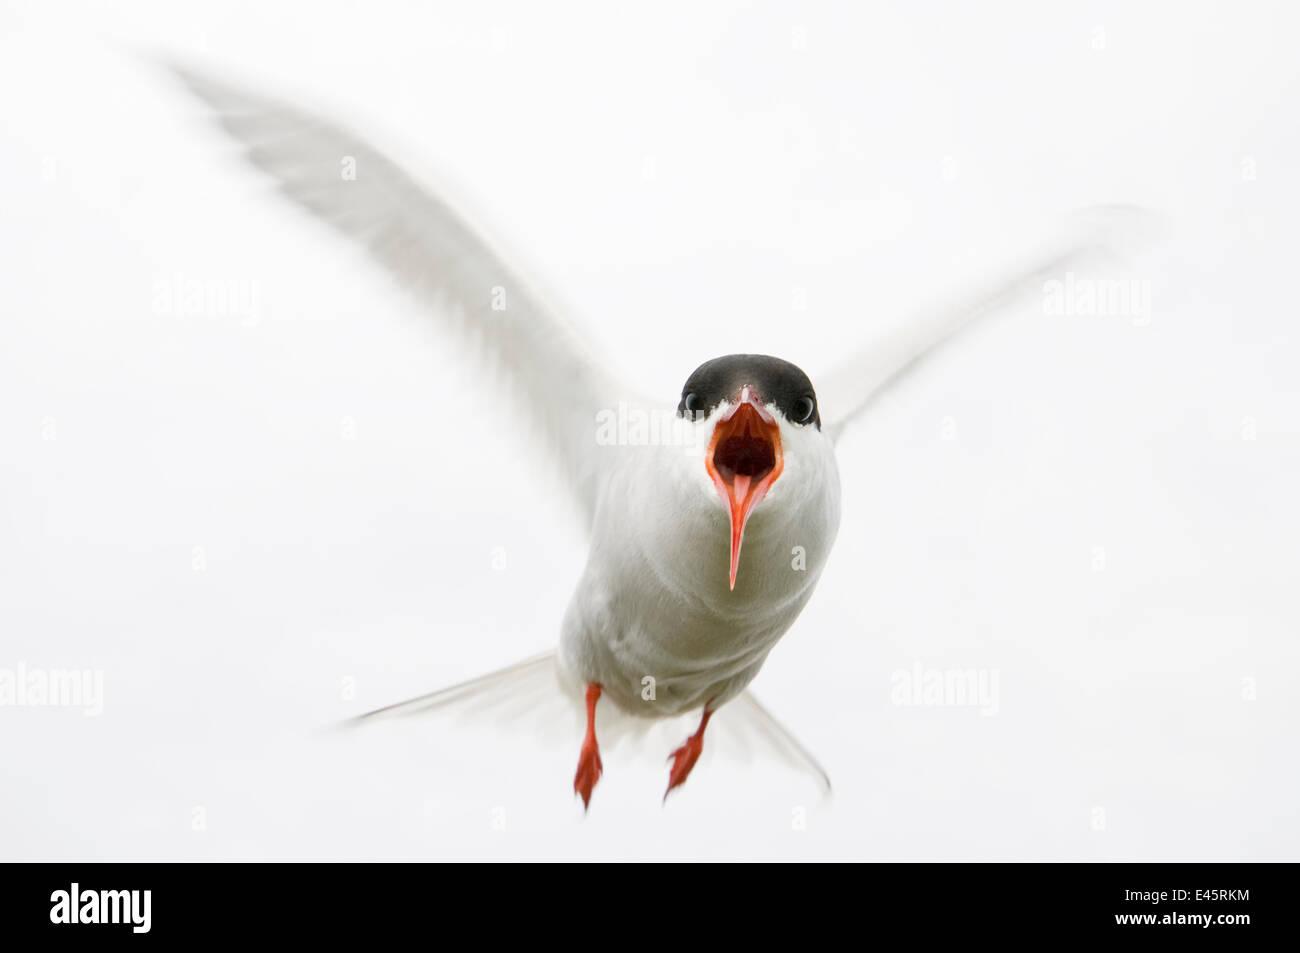 Arctic tern (Sterna paradisaea) in flight, calling, Farne Islands, Northumberland, UK, June - Stock Image